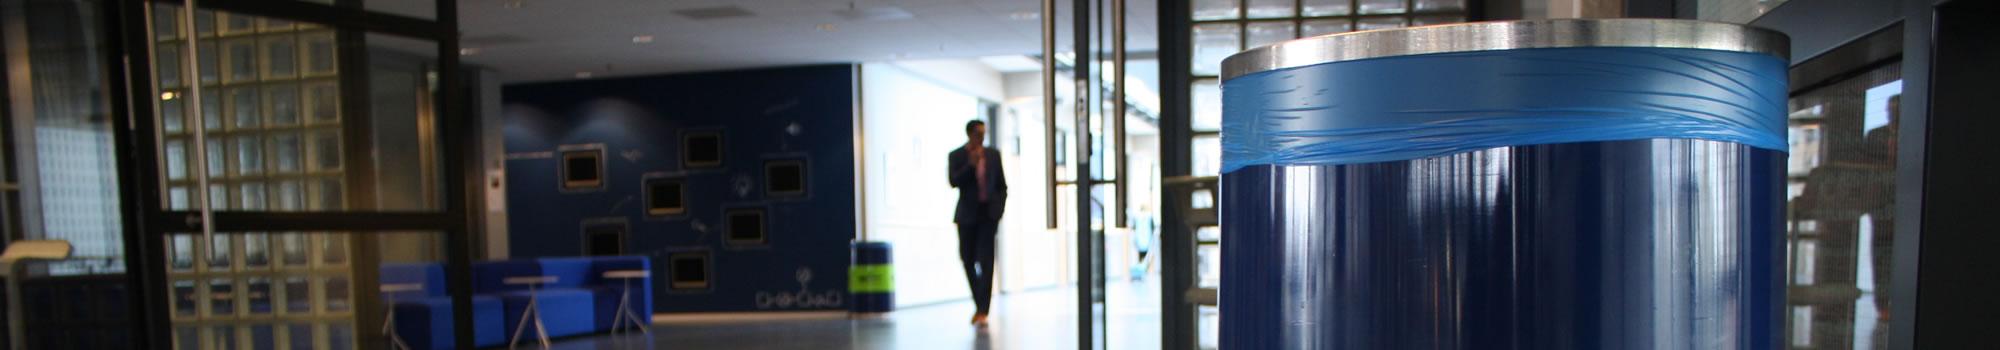 facility-care-nederland-schoon